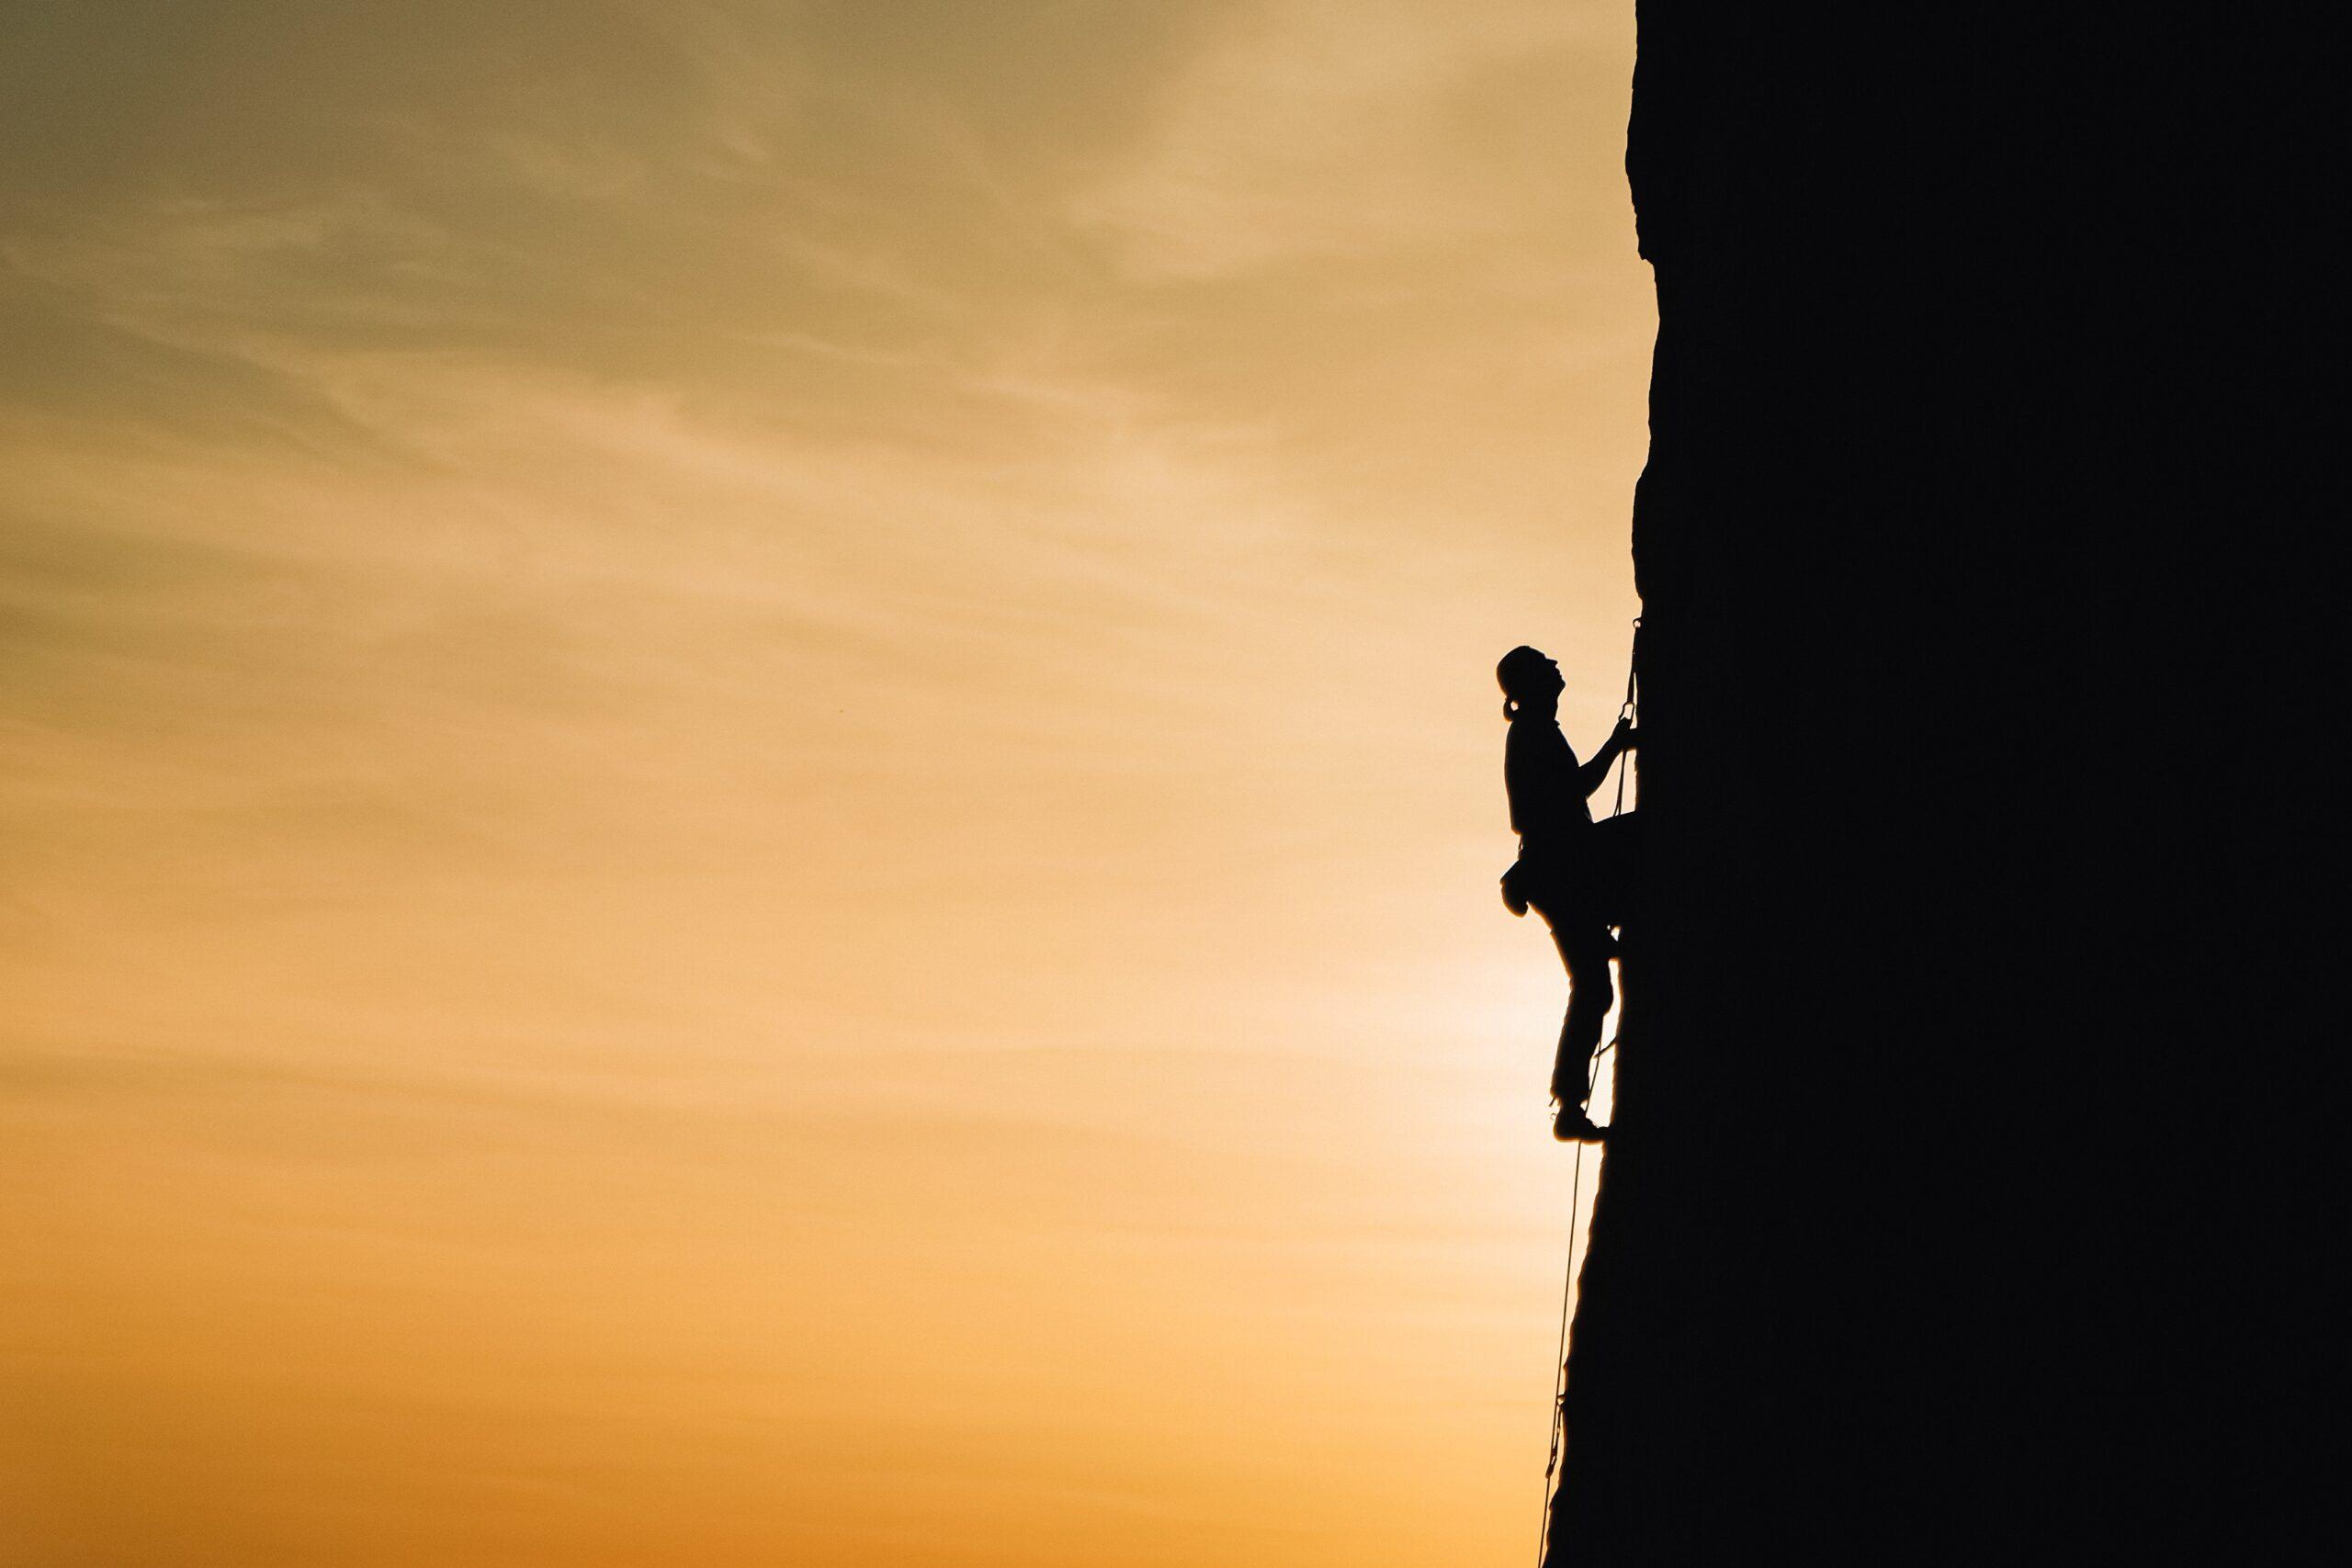 Climbing Workout: a person practising rock climbing.